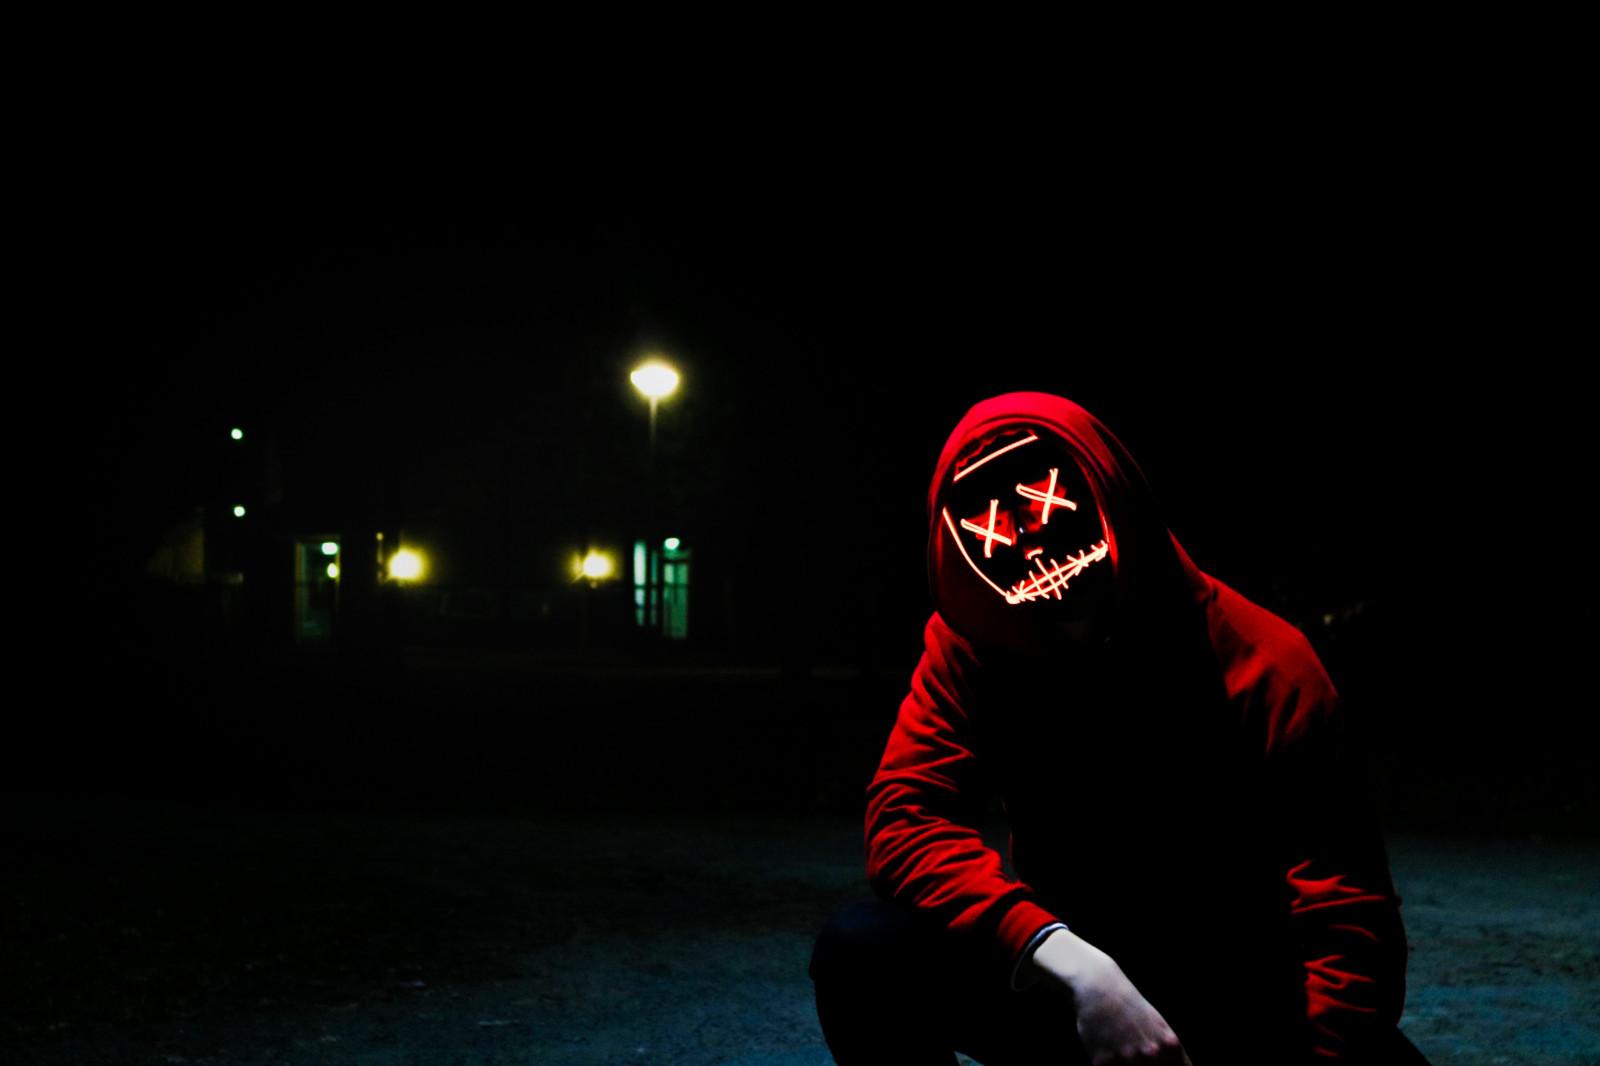 Wallpaper Dark Background Male Models Men Night Hoods